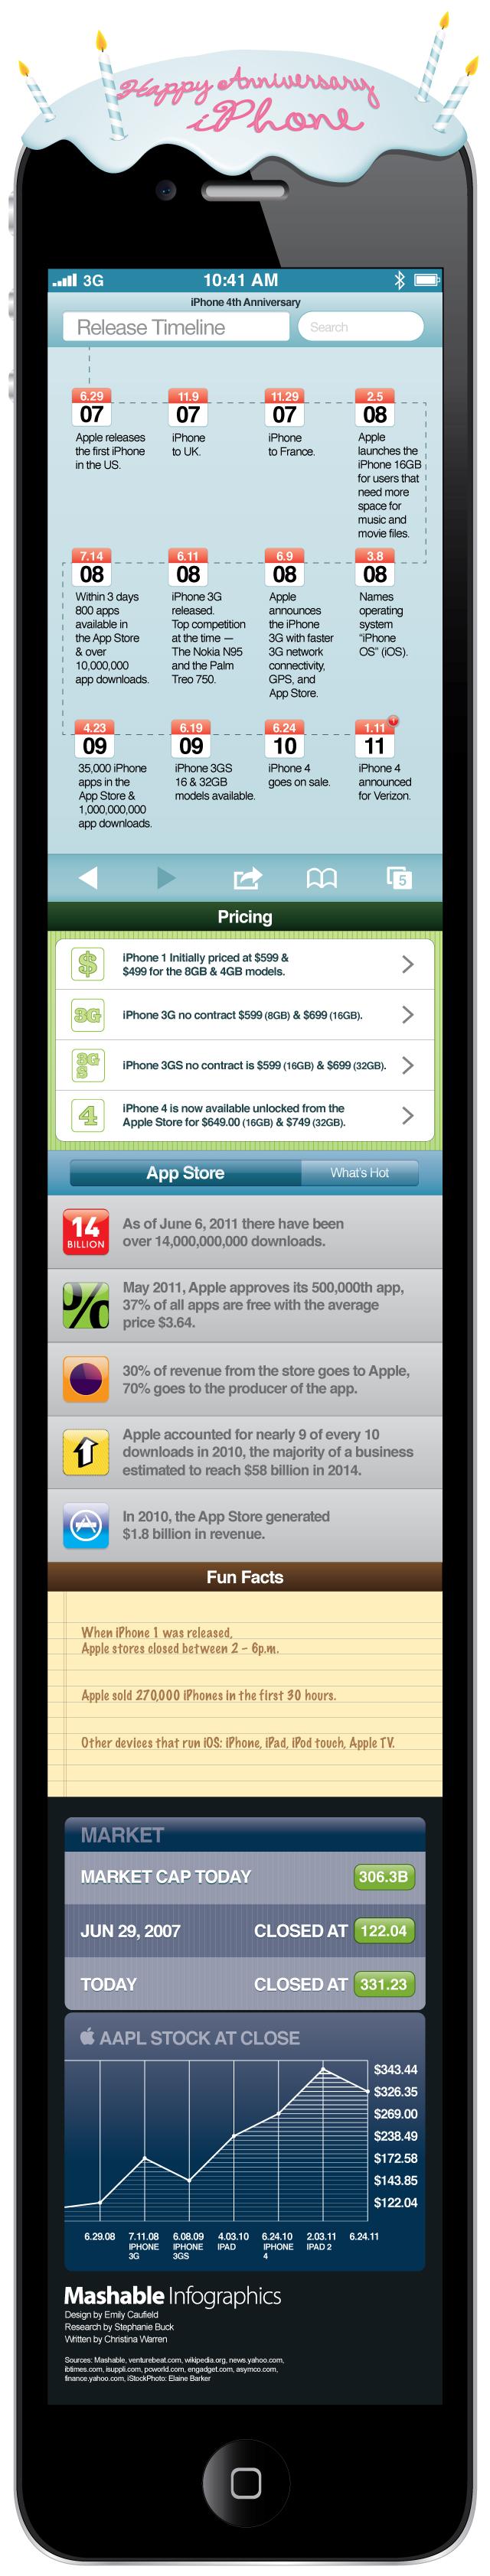 mashable infographics iphone anniversary 640 - Bon 4e anniversaire iPhone! [Infographique]